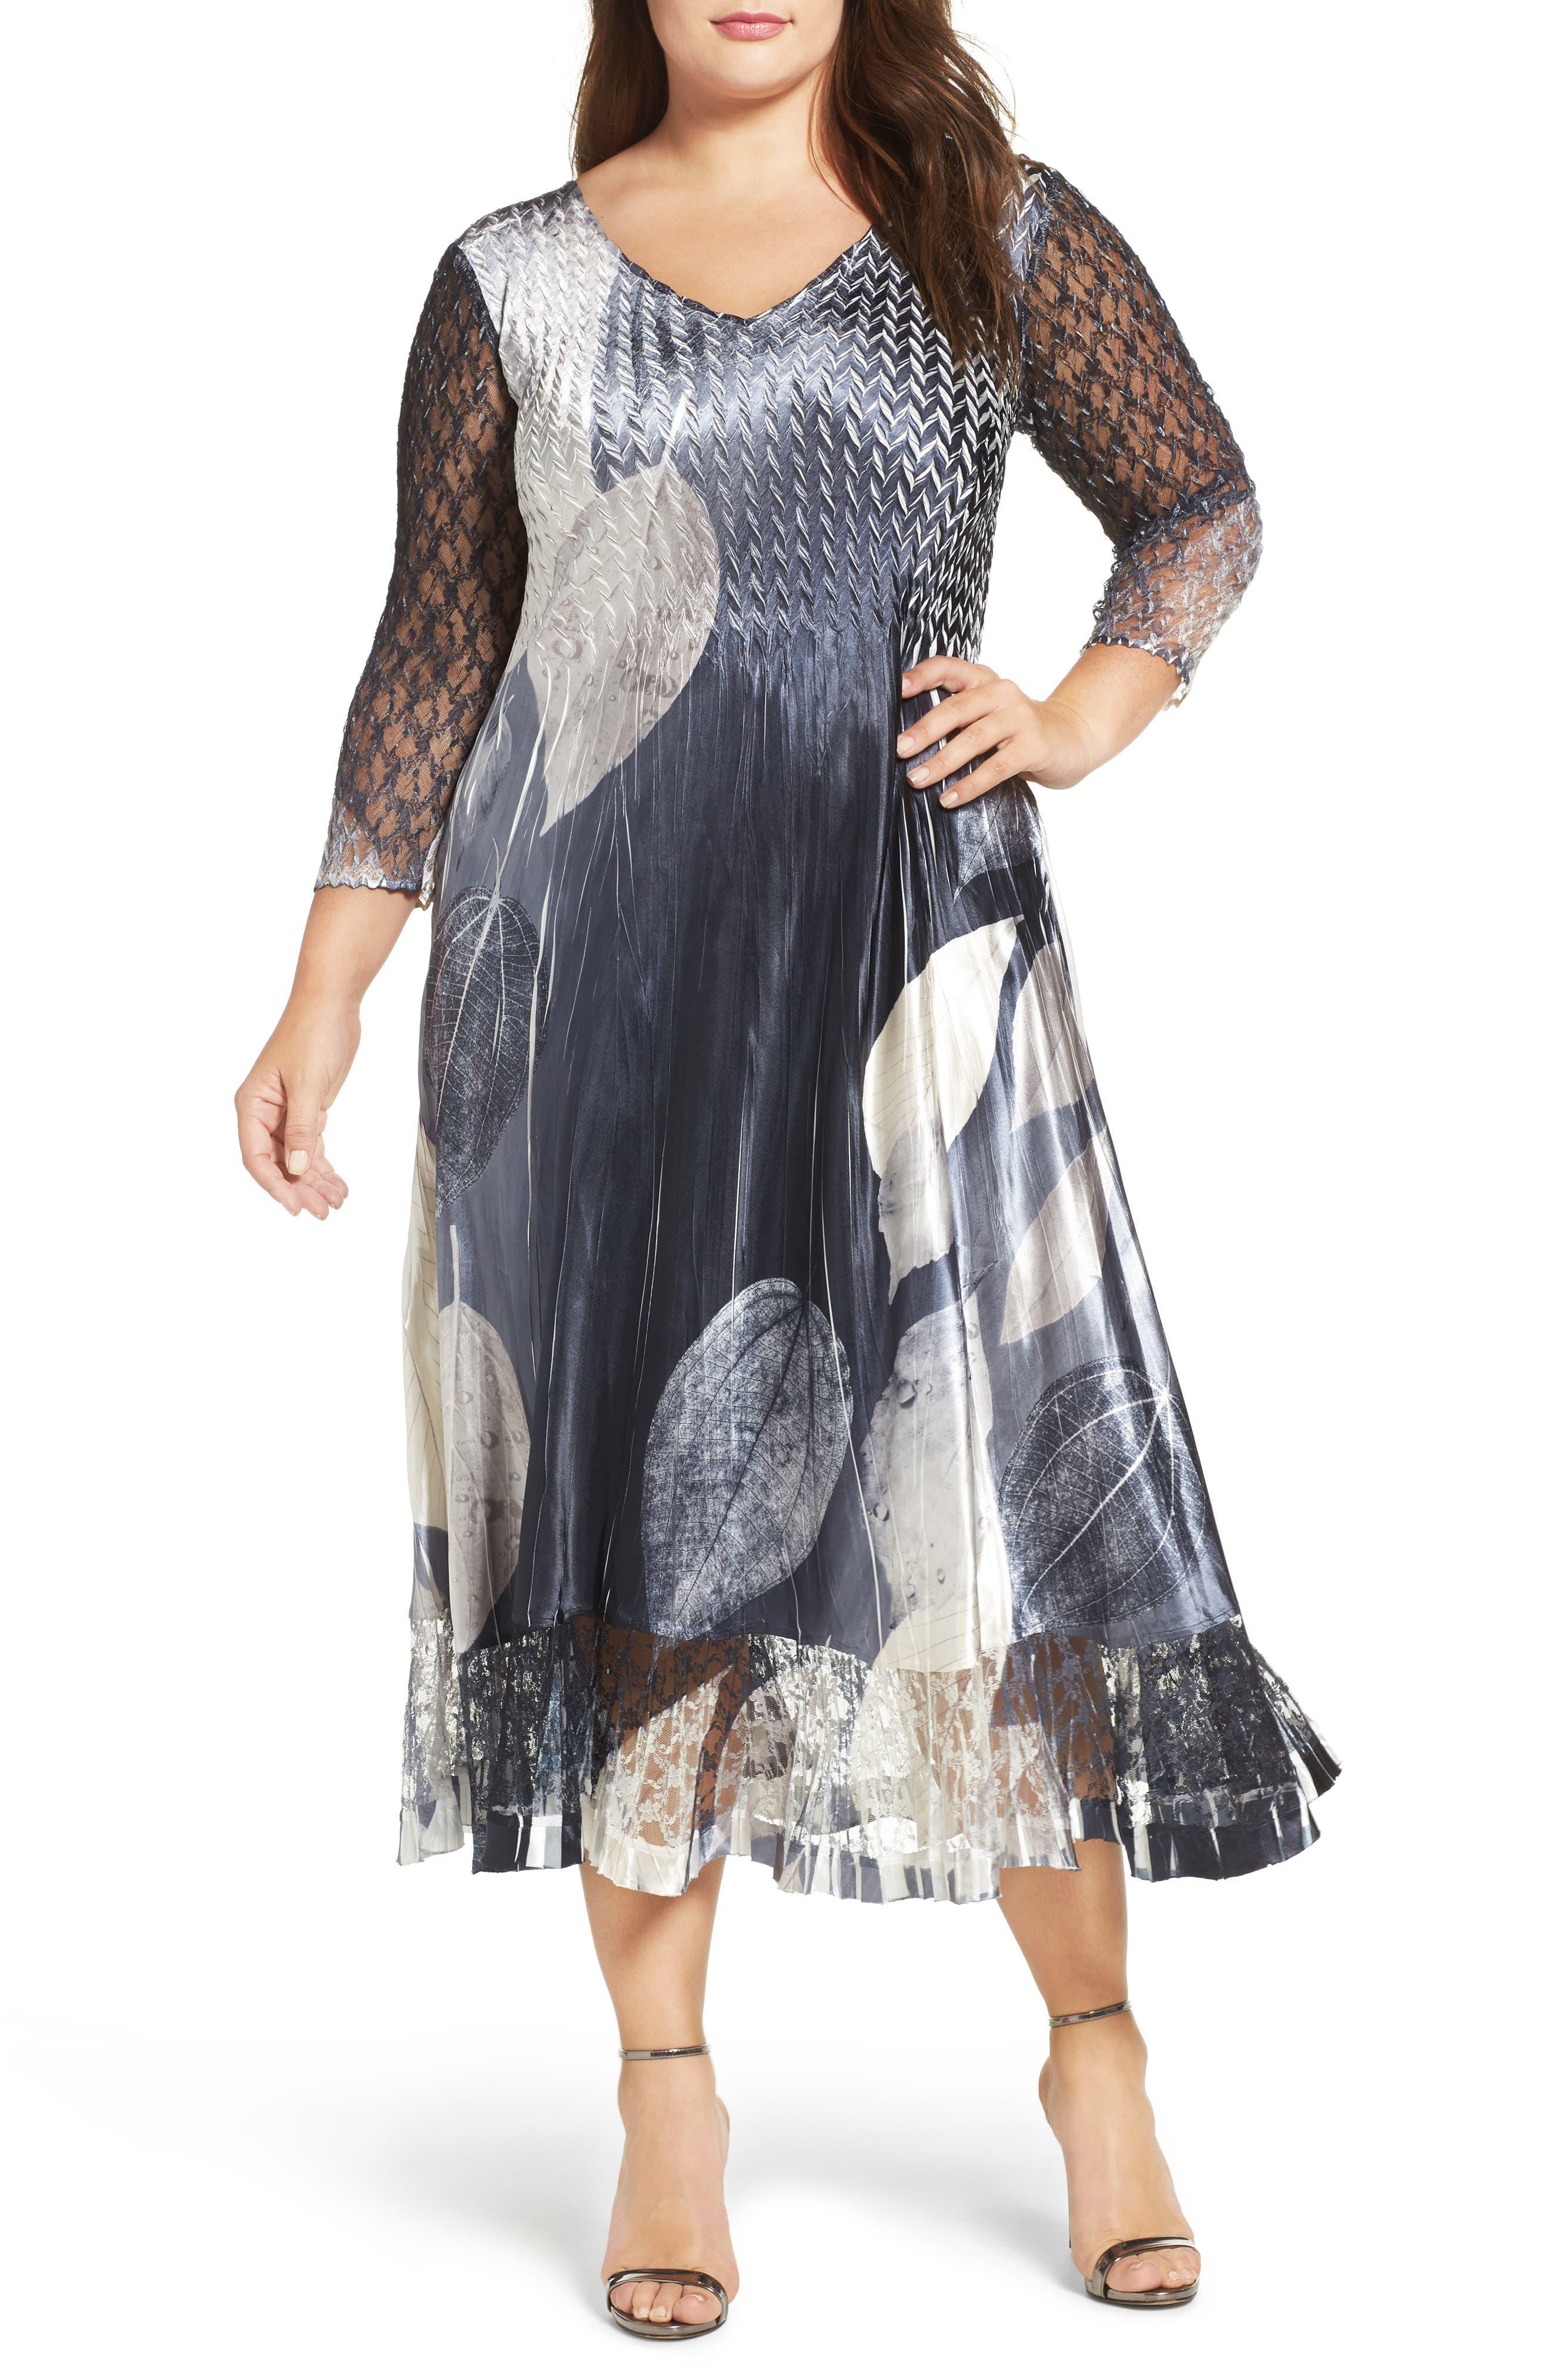 Alternate Image 1 Selected - Komarov Mixed Media Midi Dress (Plus Size)